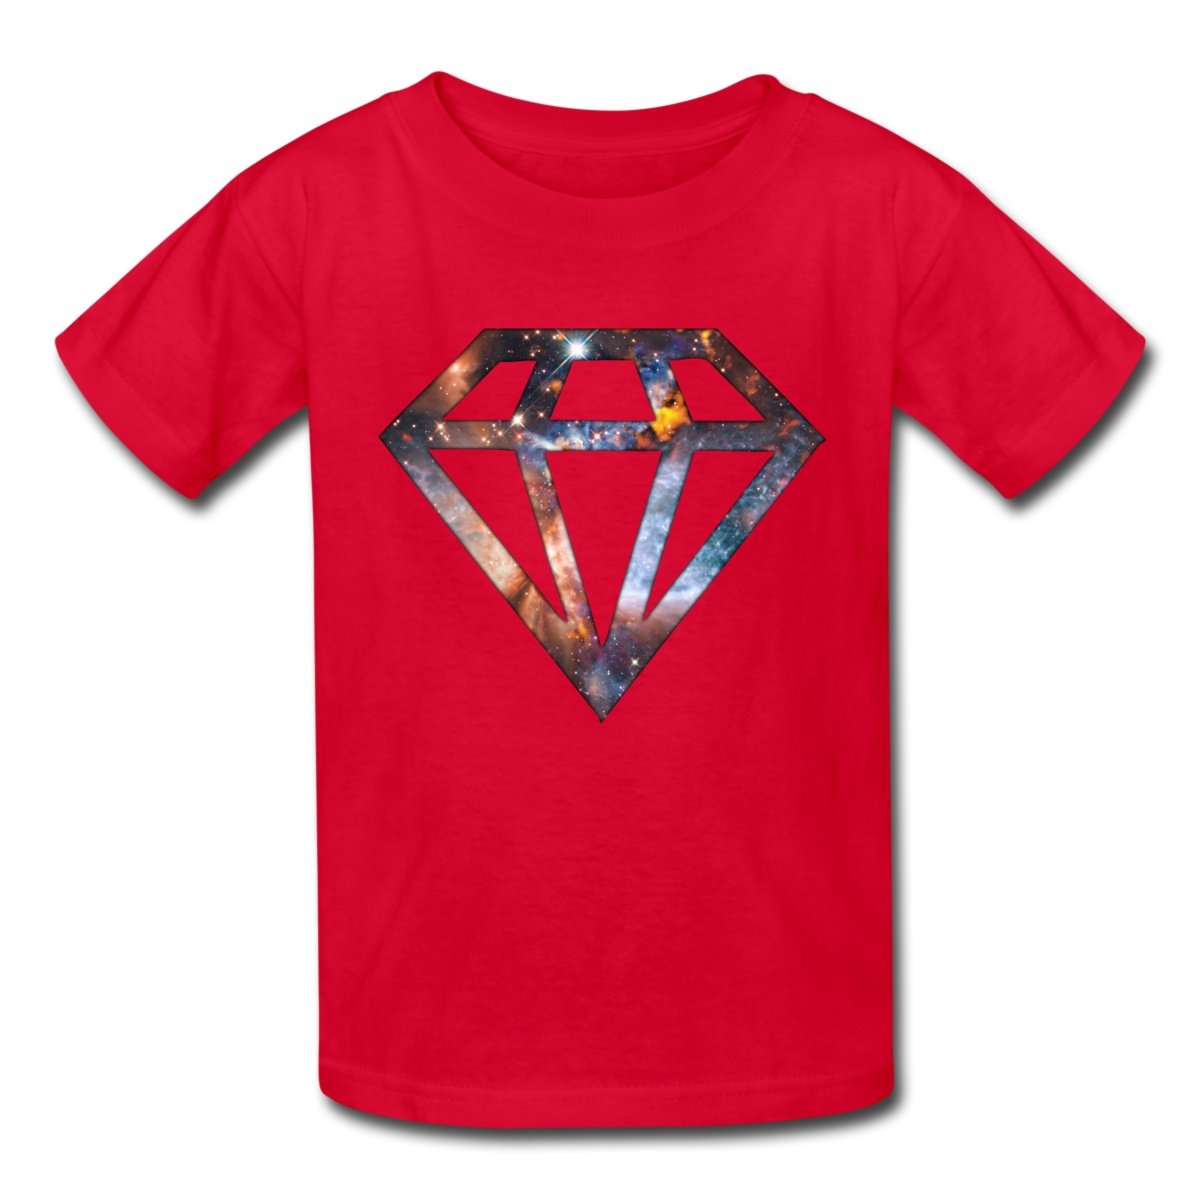 Cosmic Diamond T Shirt 4638